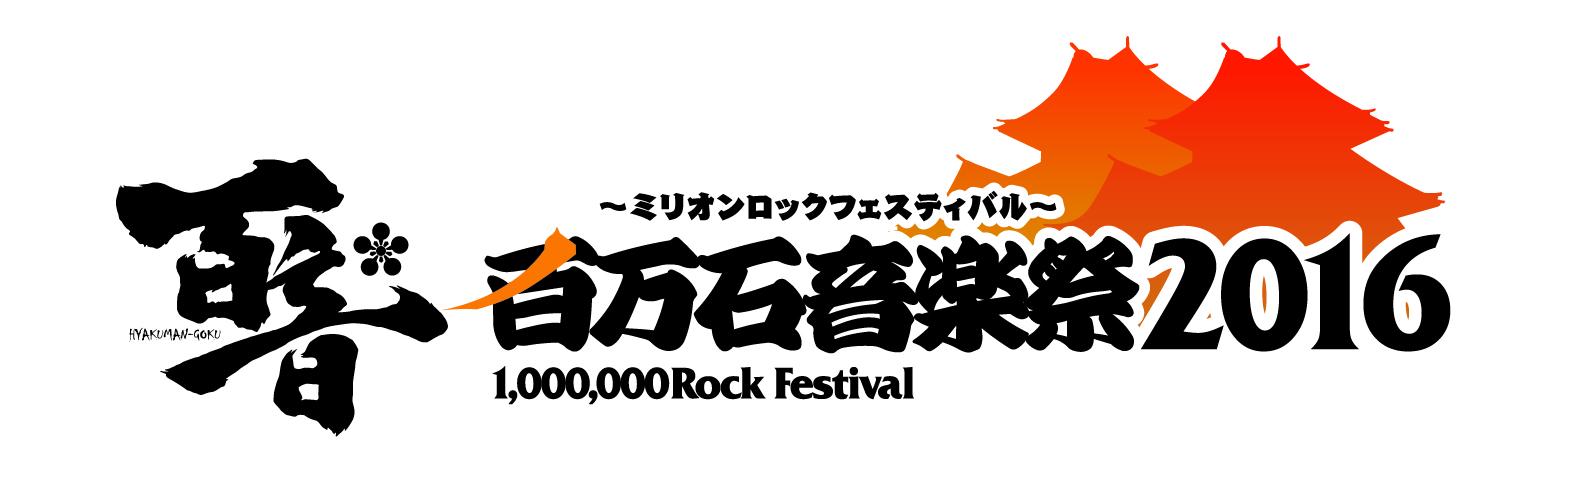 百万石音楽祭2016_ロゴ-01